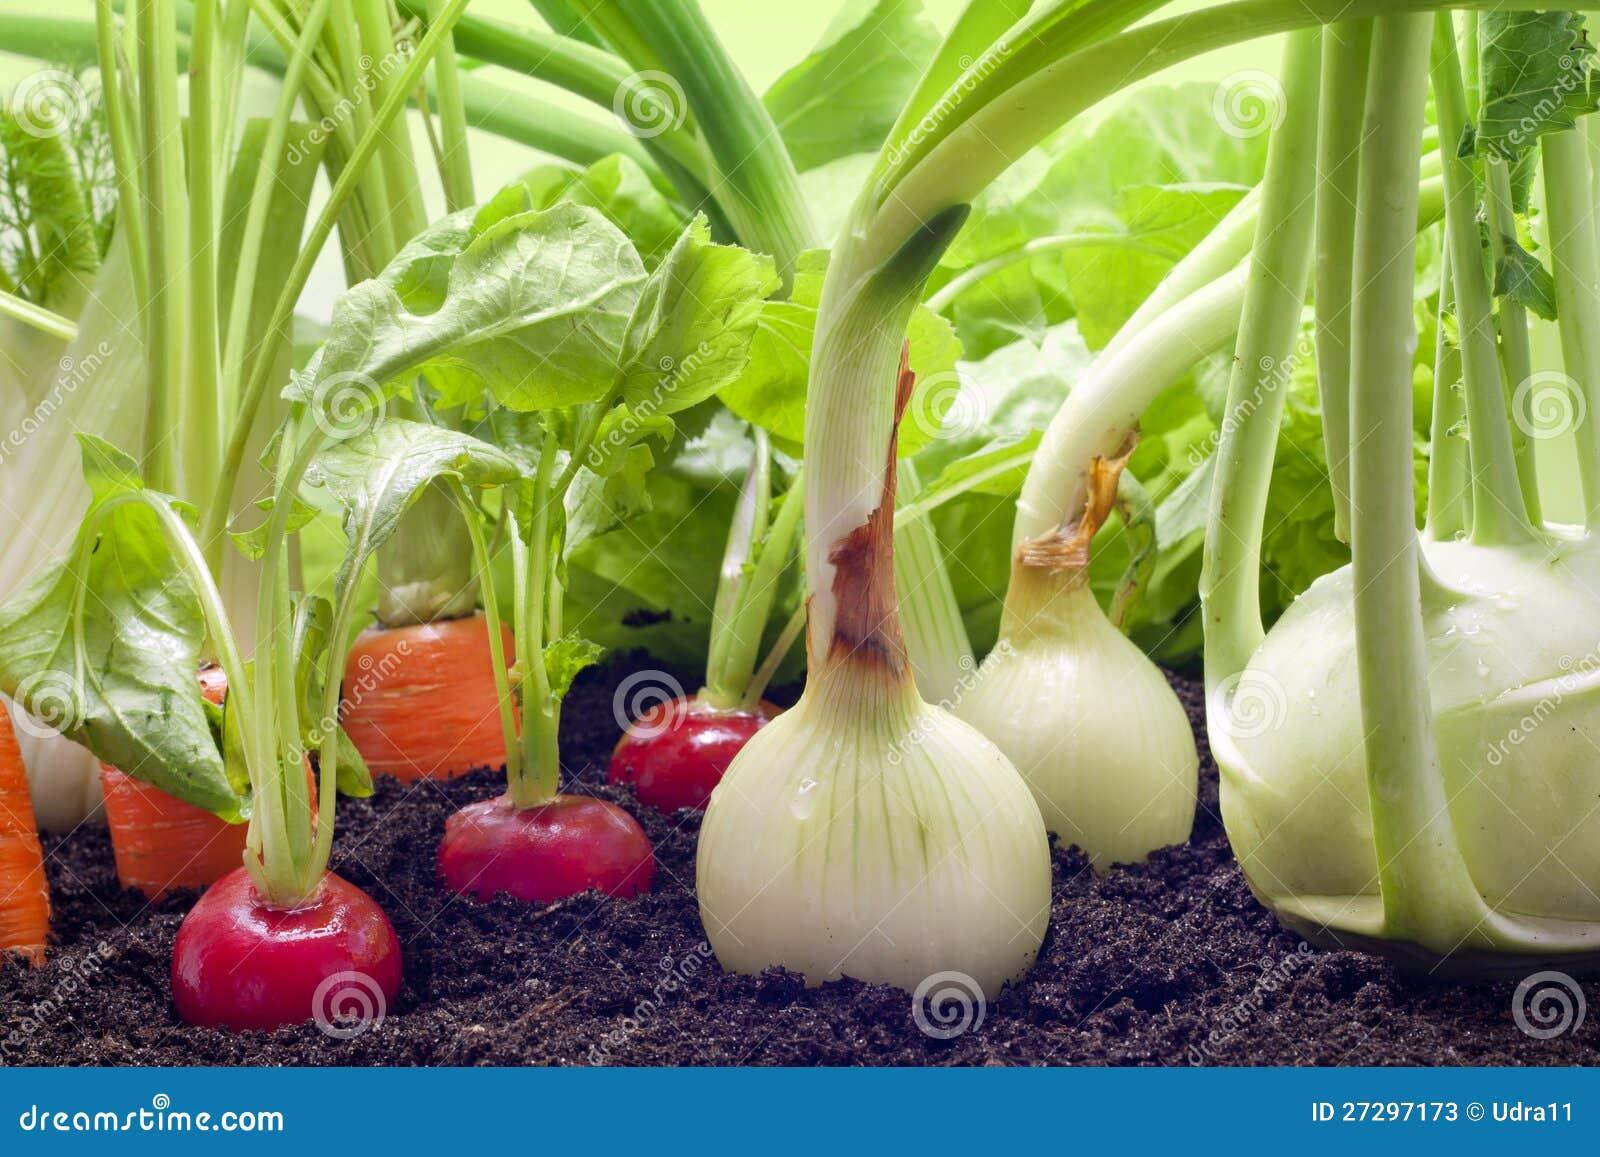 Urban wall gardening - Vegetables Growing In The Garden Stock Photos Image